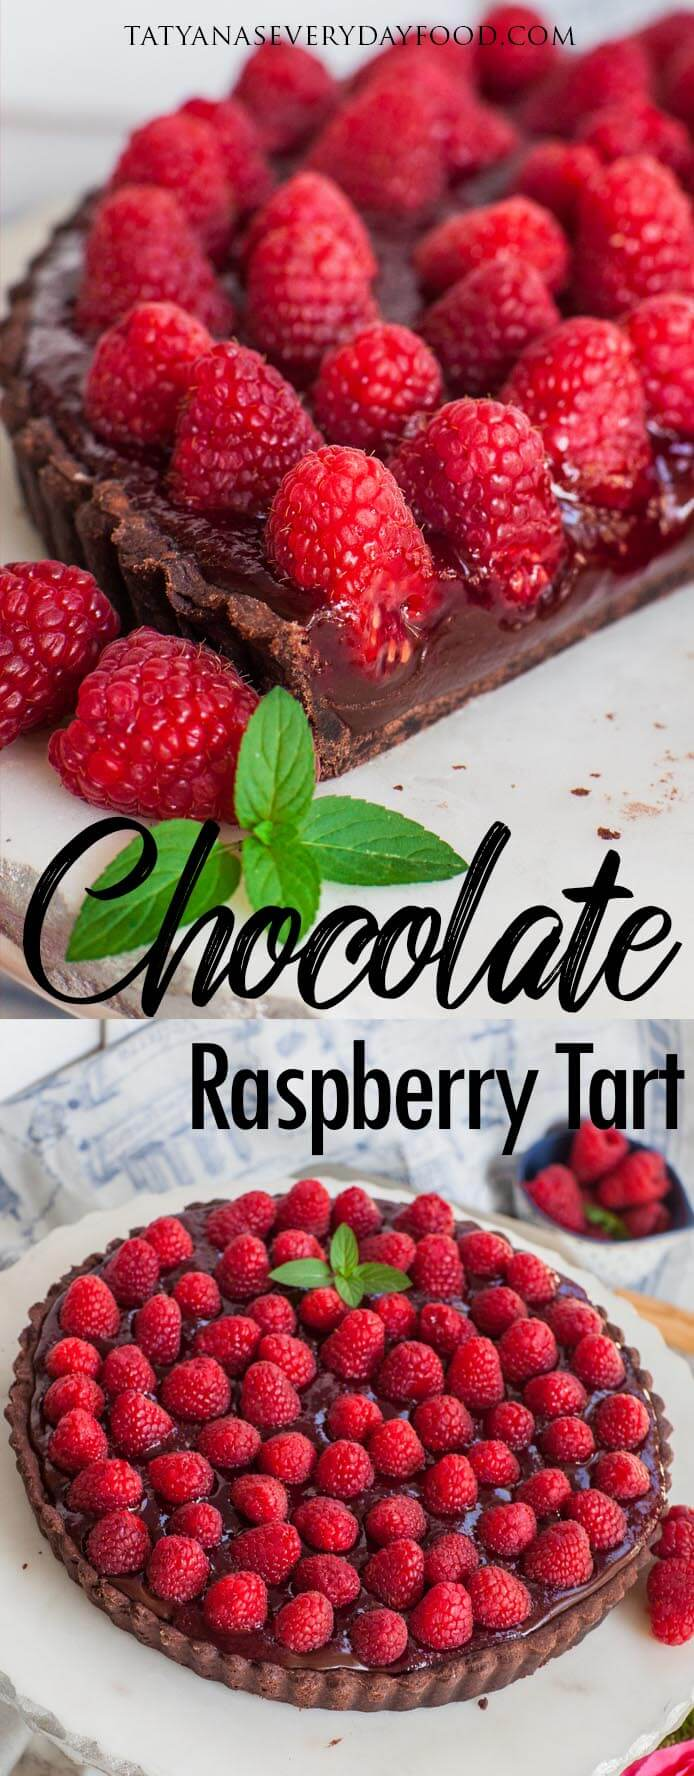 Caramel Chocolate Raspberry Tart with video recipe